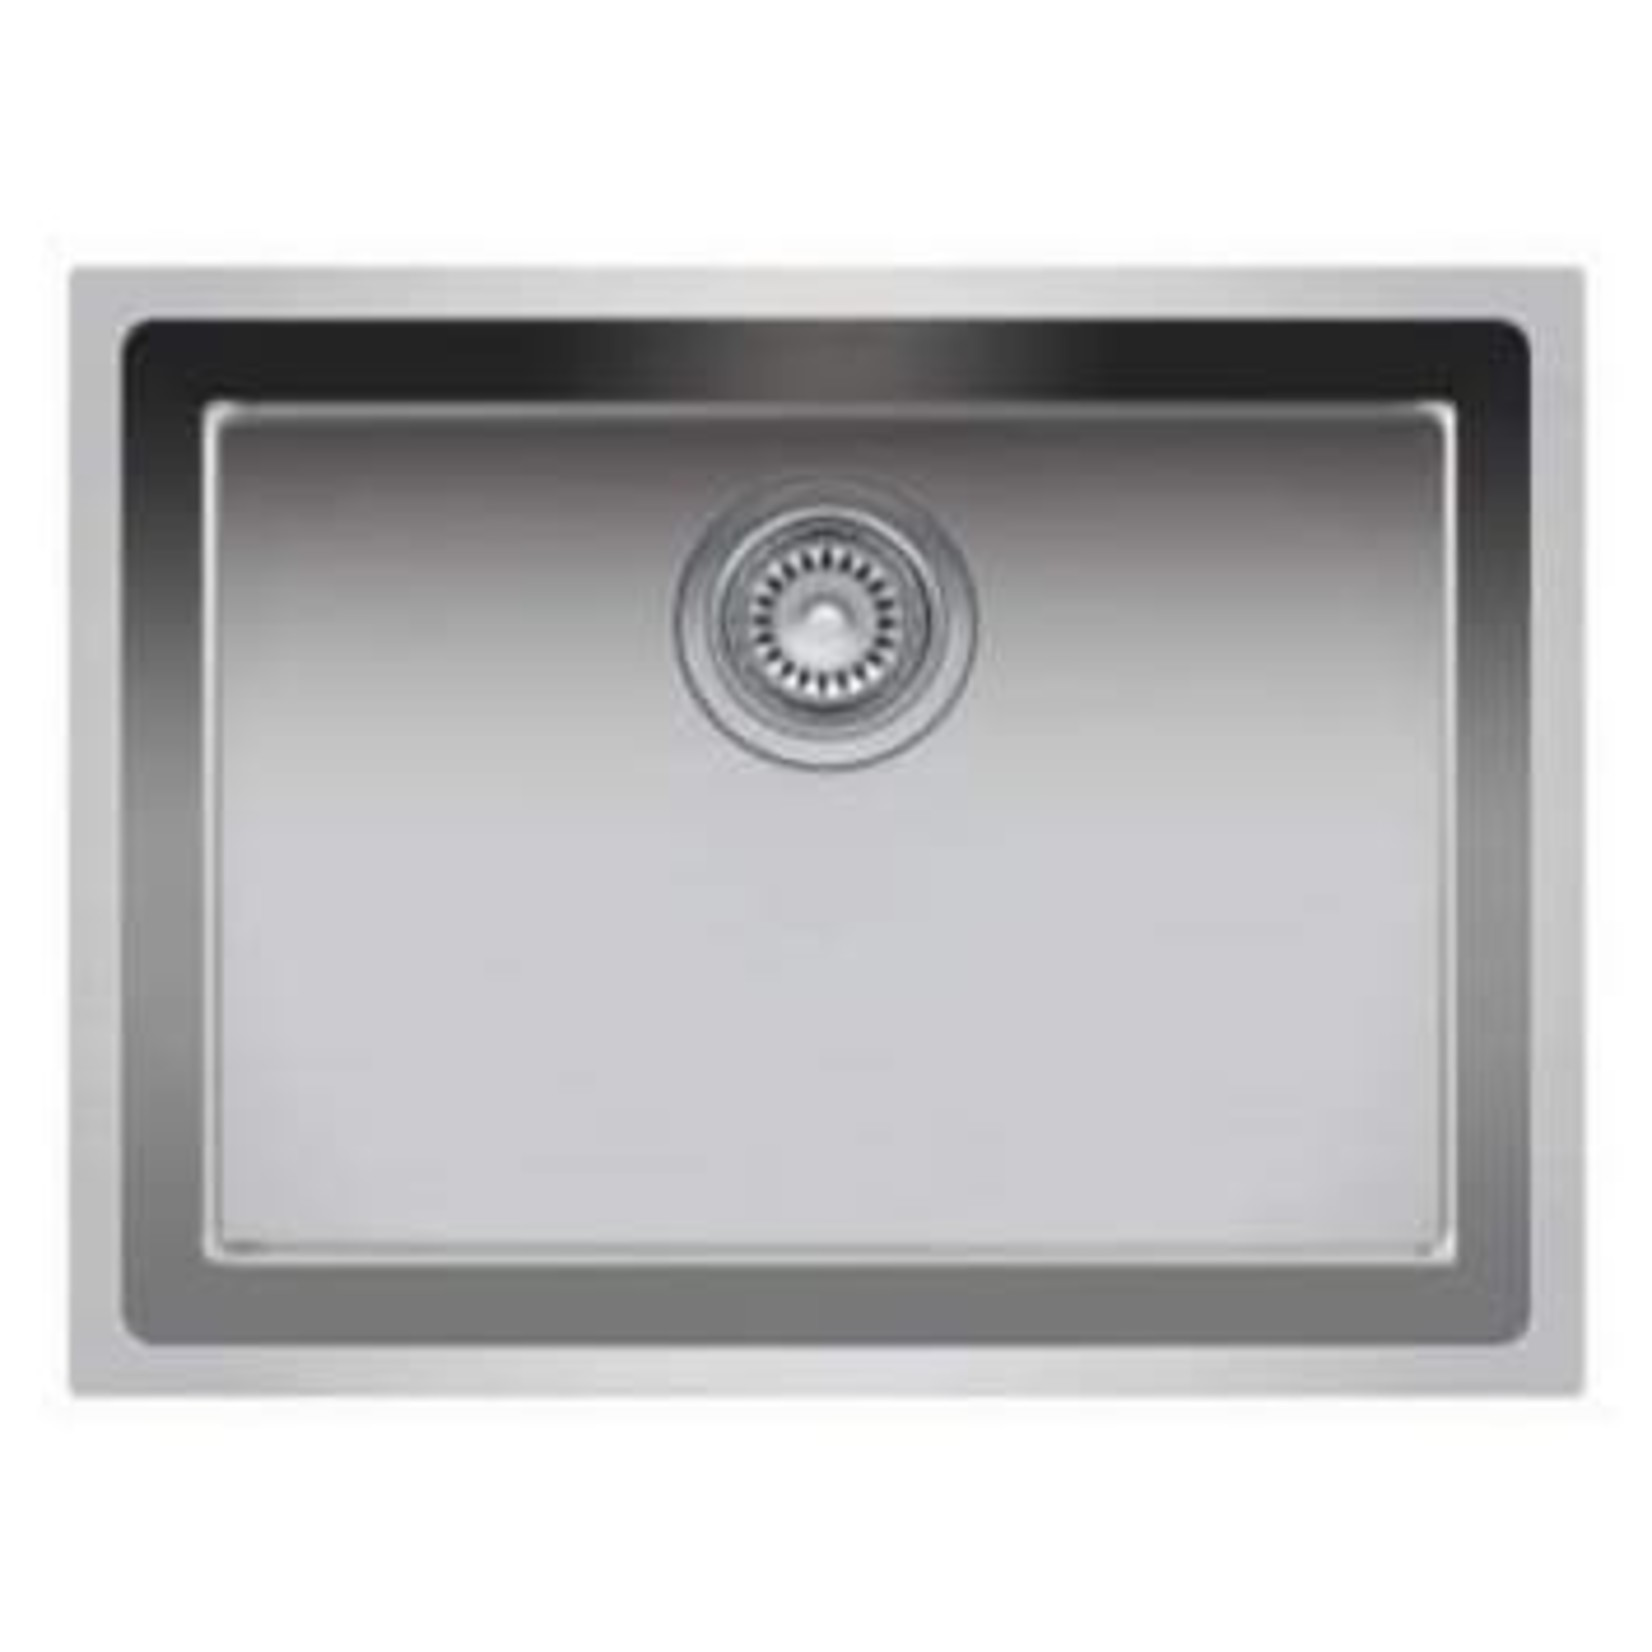 "Single bowl undermount kitchen sink 31 ""x 18"" x 9 ""ZR103U"